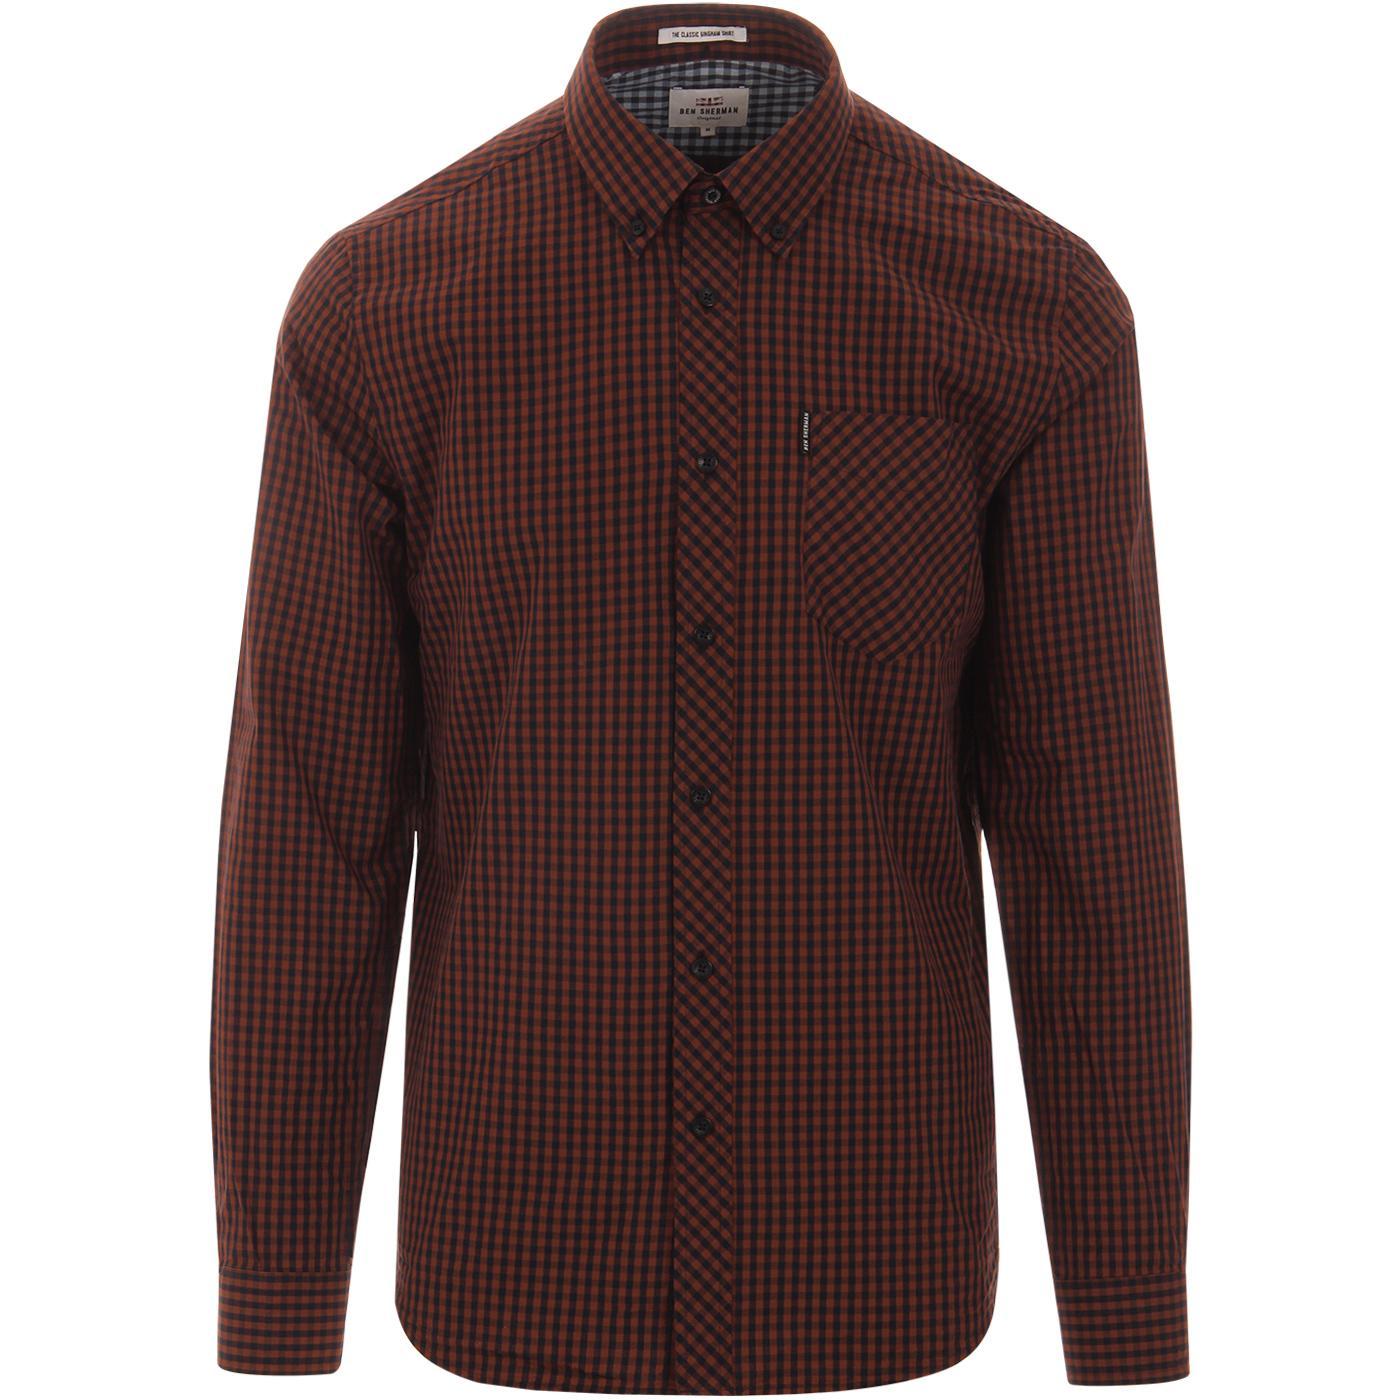 BEN SHERMAN Classic Mod Gingham Check Shirt (Br)